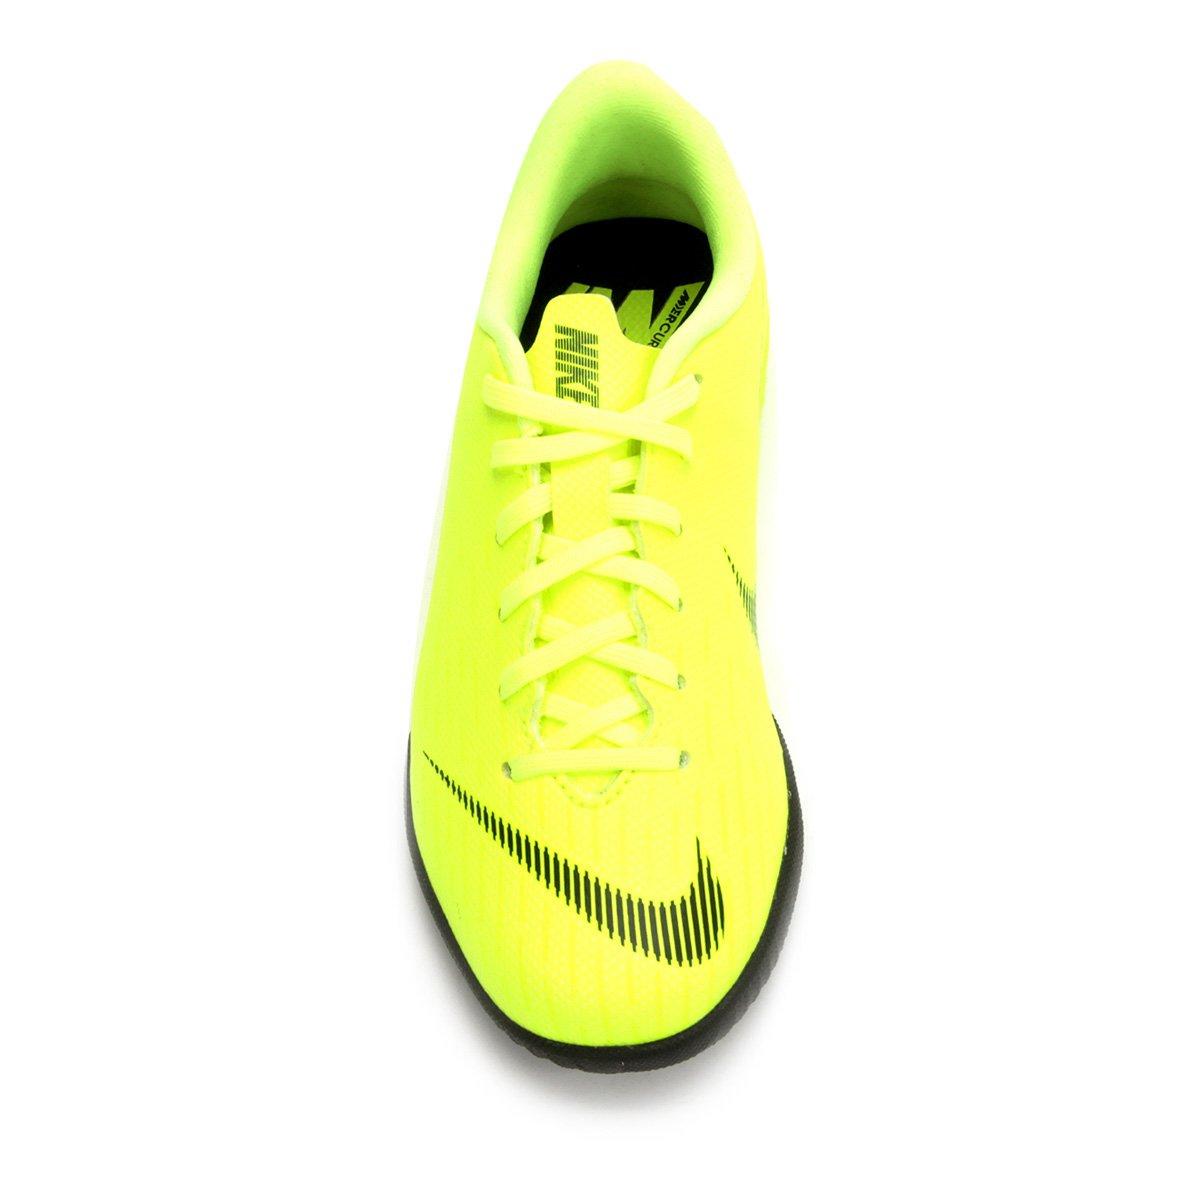 e006b12a85b93 ... Chuteira Futsal Infantil Nike Mercurial Vapor 12 Academy GS IC - 2 ...